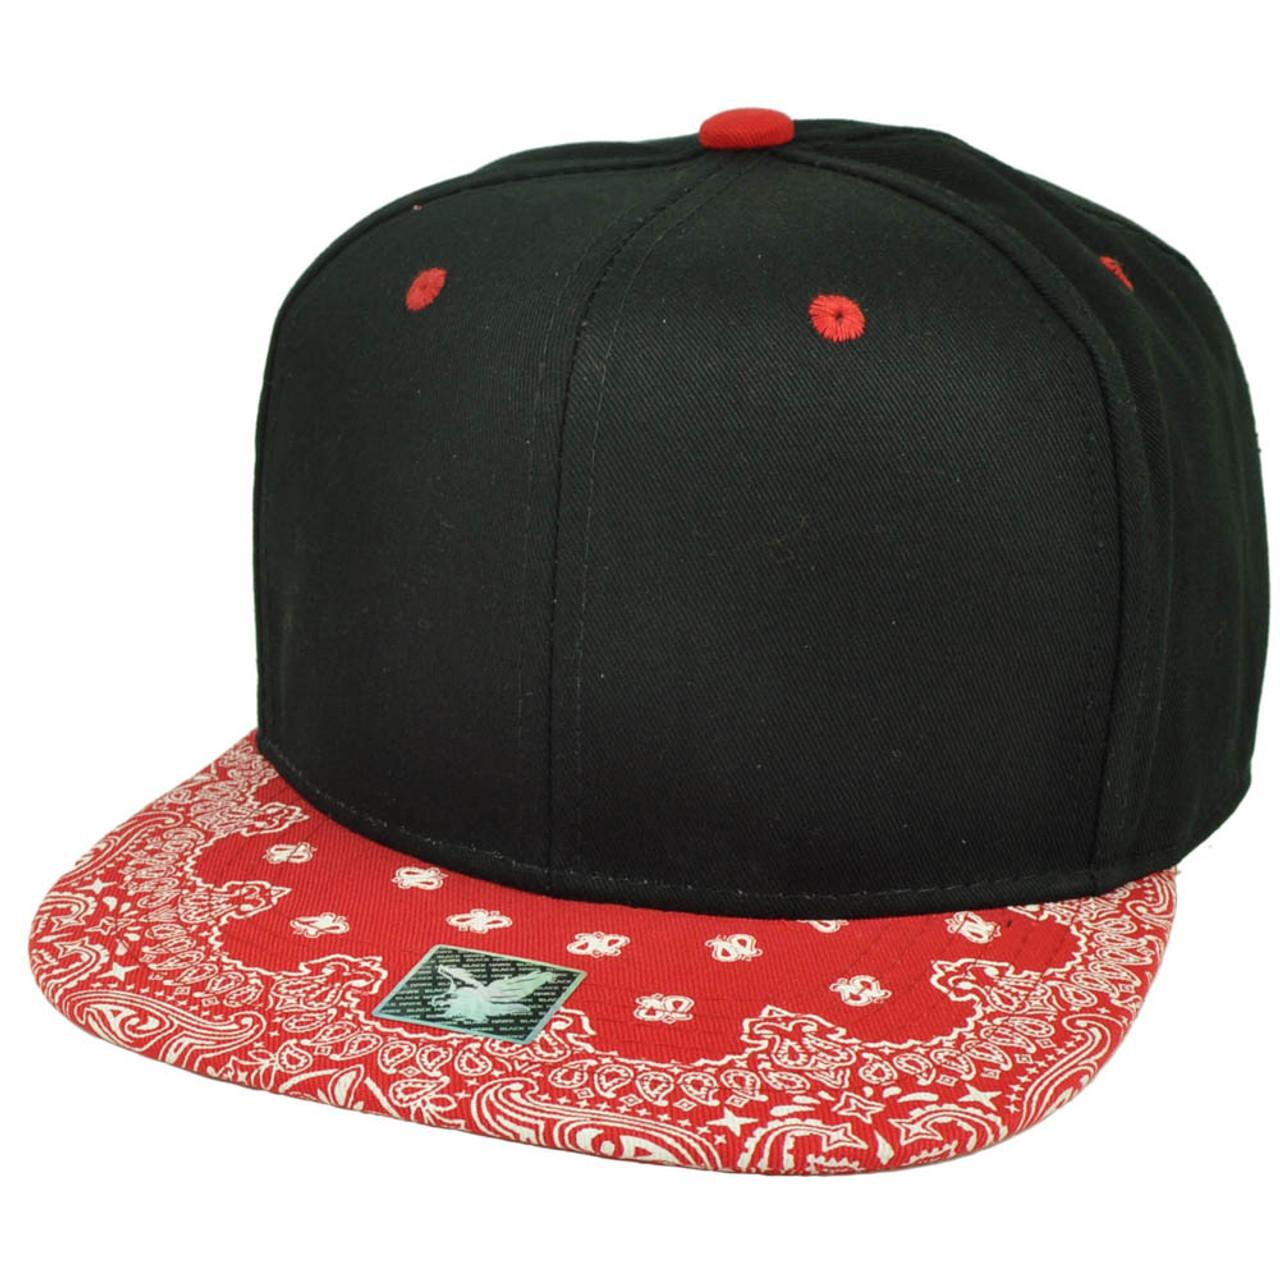 06072a868cf9b5 Black Red Bandana Print Pattern Flat Bill Hat Cap Snapback Plain Blank Solid  - Cap Store Online.com